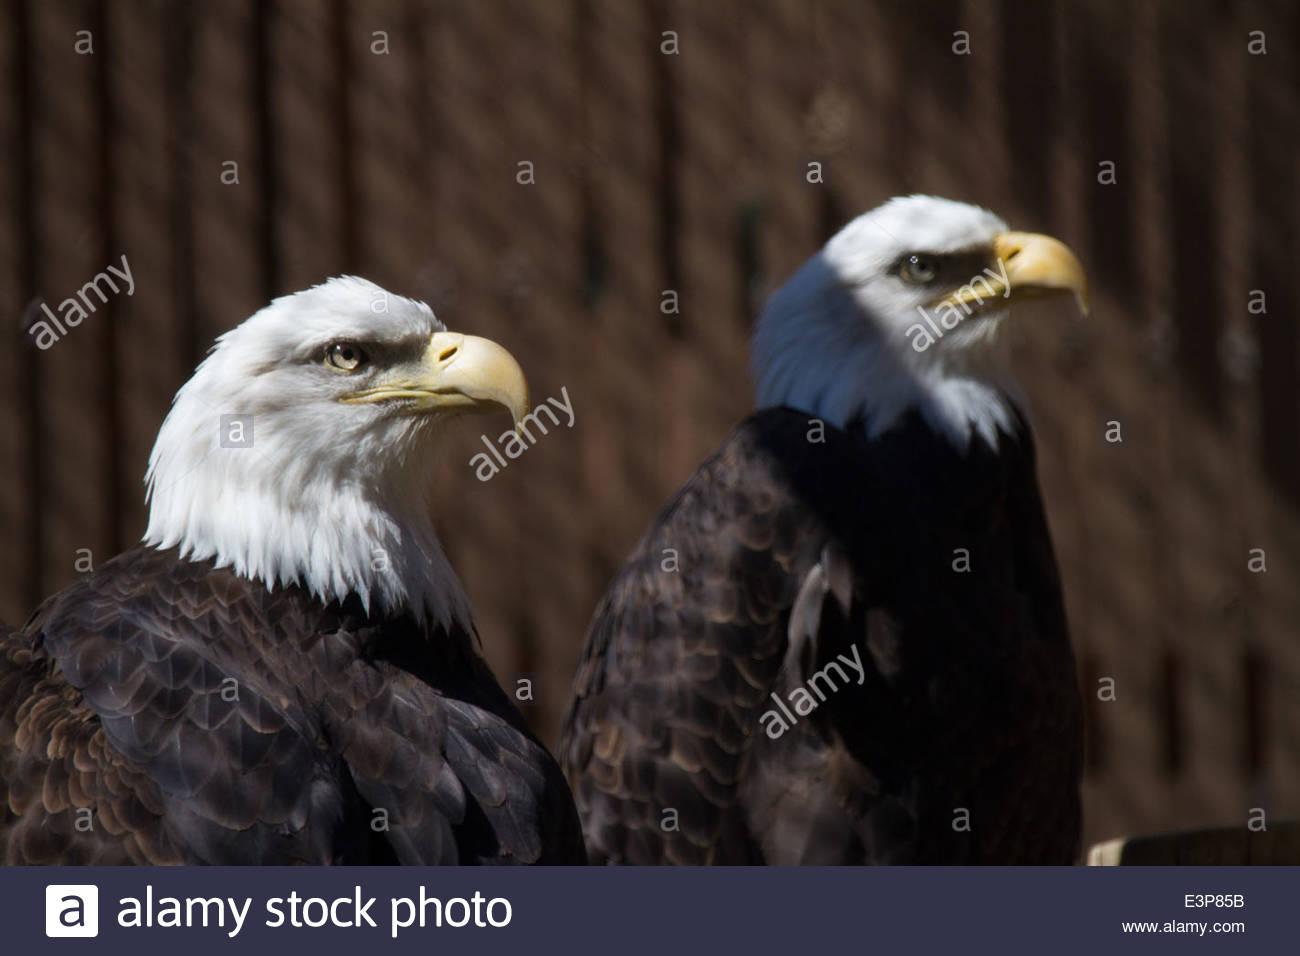 Captive Injured Bald Eagles At Rehabilitation Center, The Dalles, Oregon, USA - Stock Image